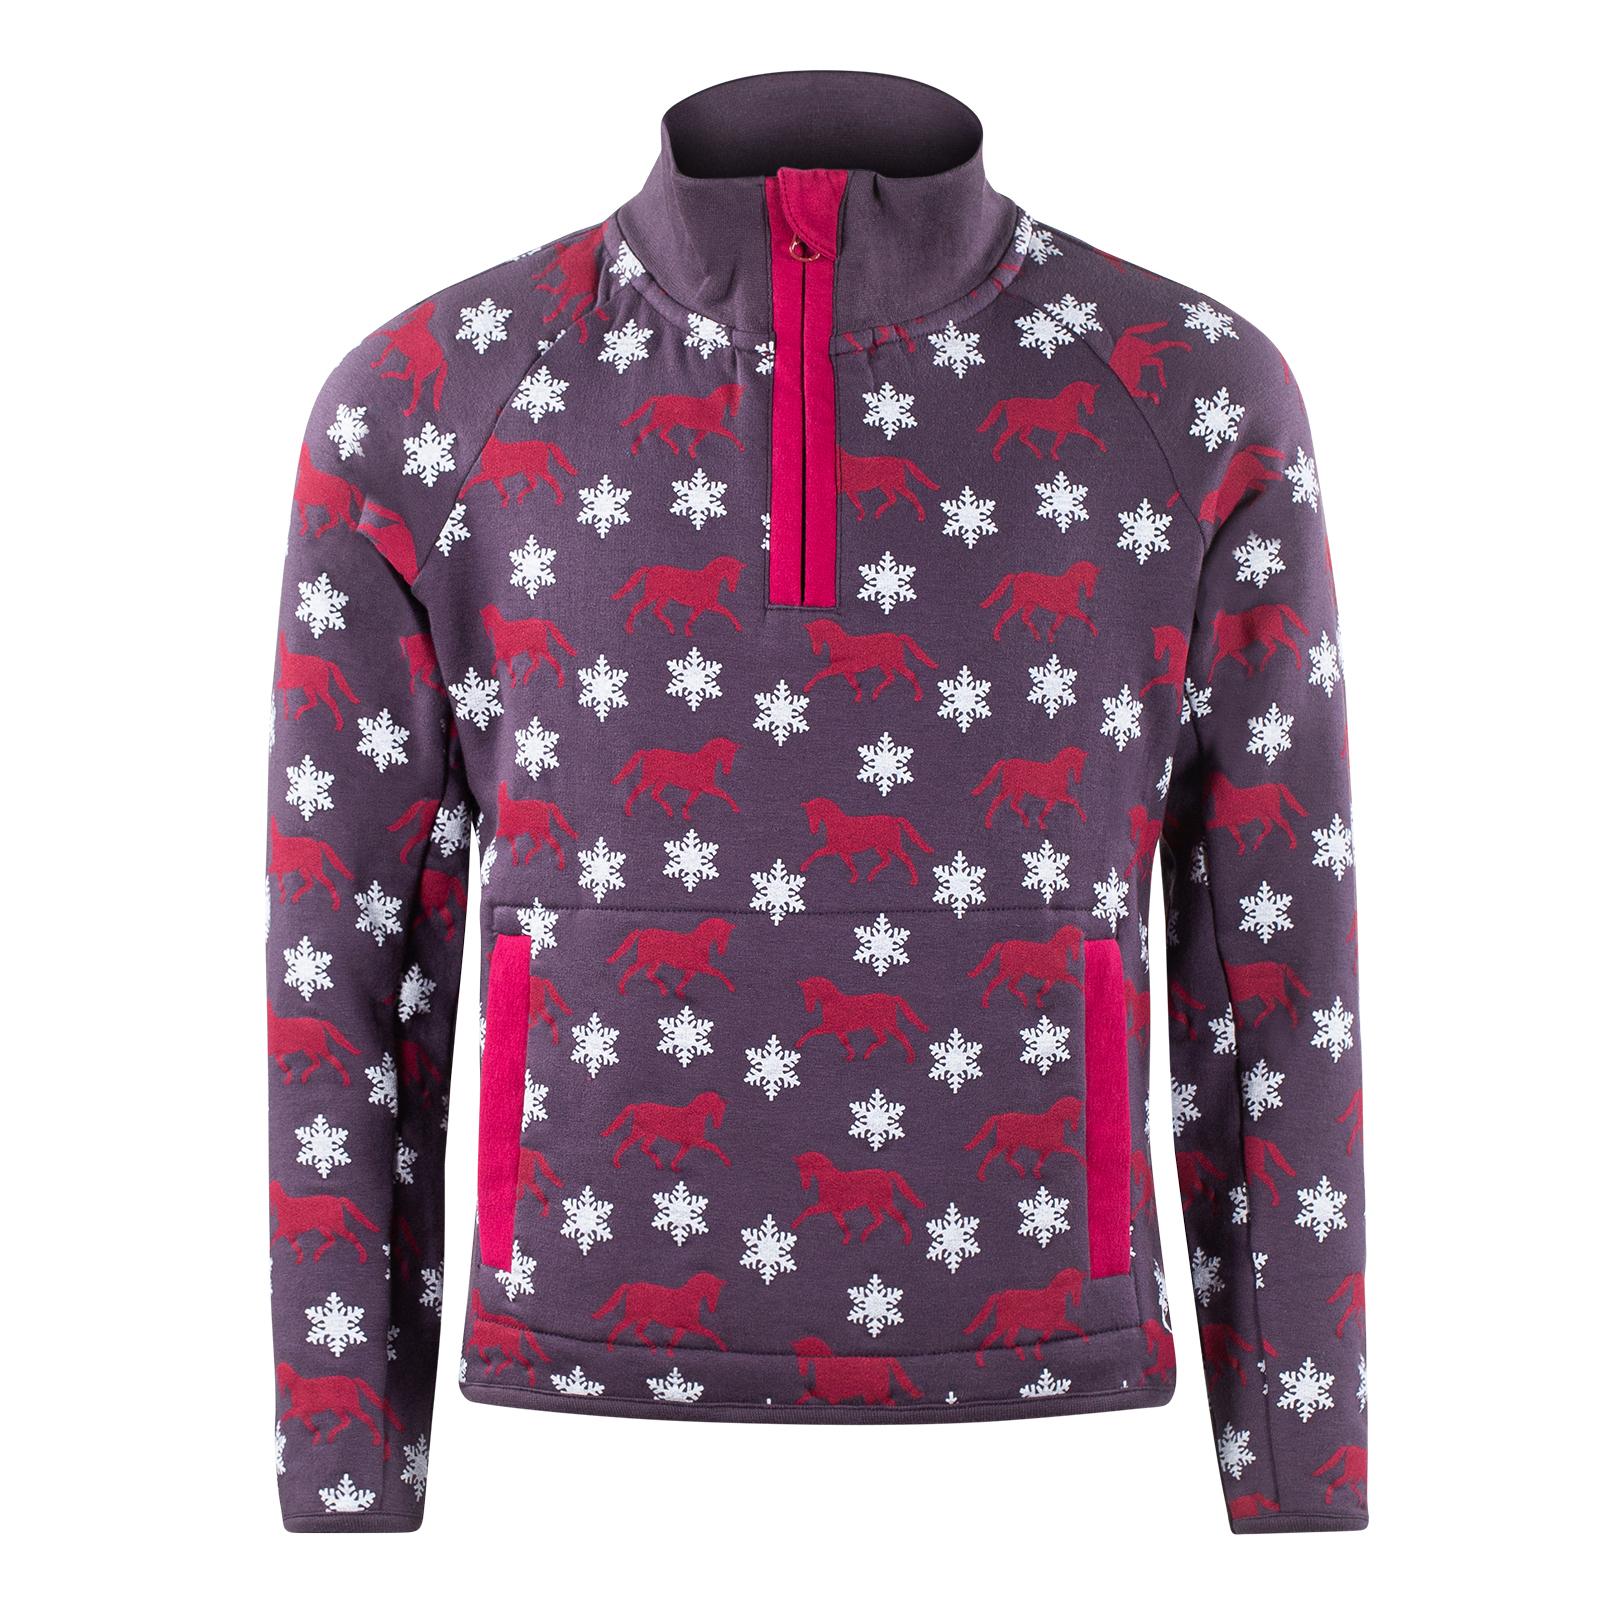 Buy affordable Kids Riding Sweatshirts & Hoodies now | horze.eu